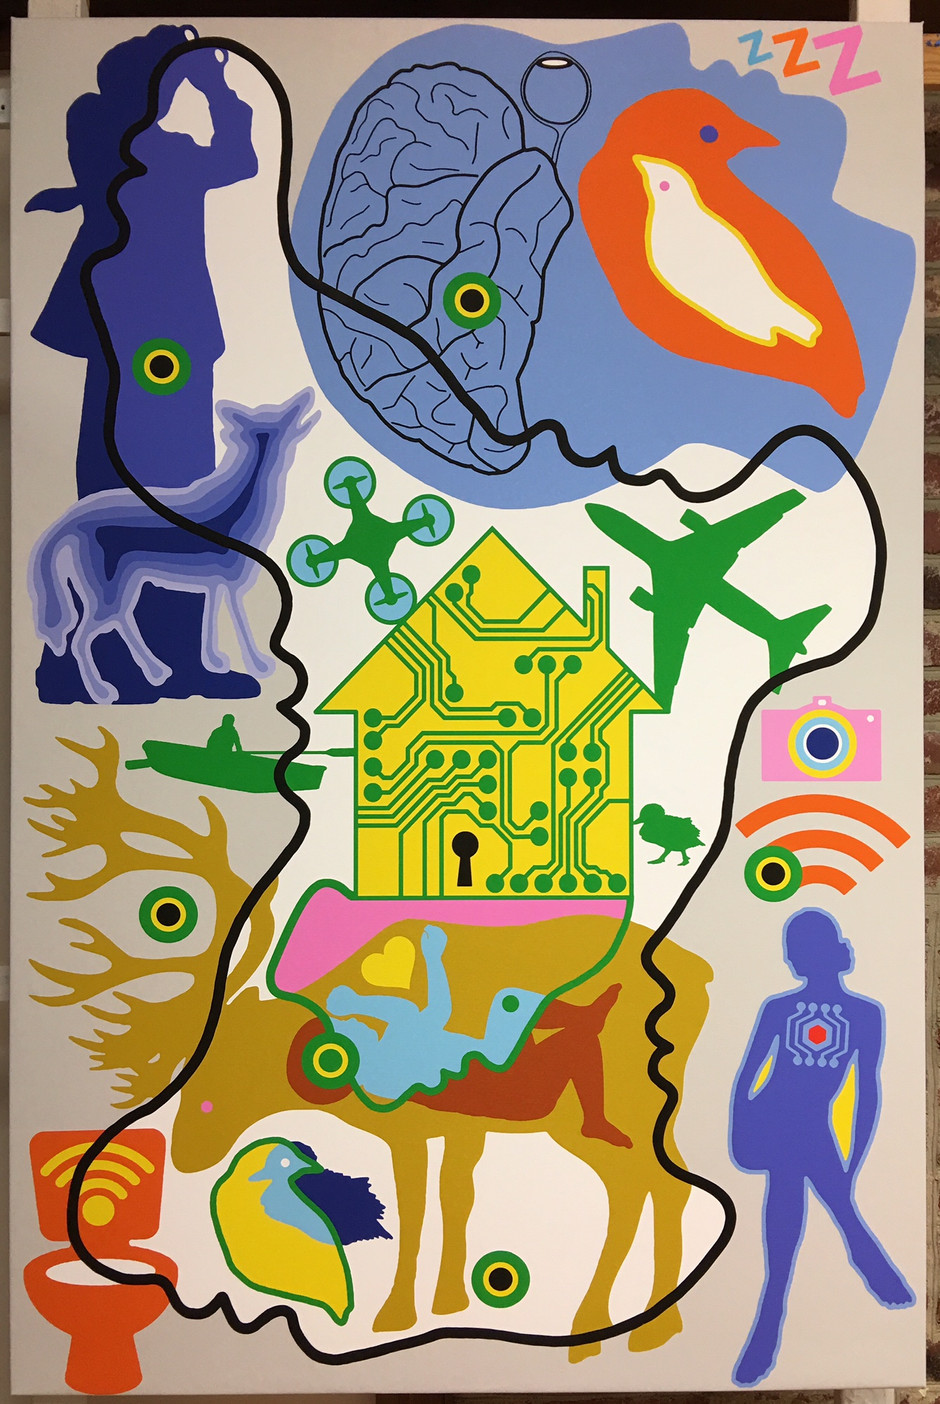 Smart Home (2017)